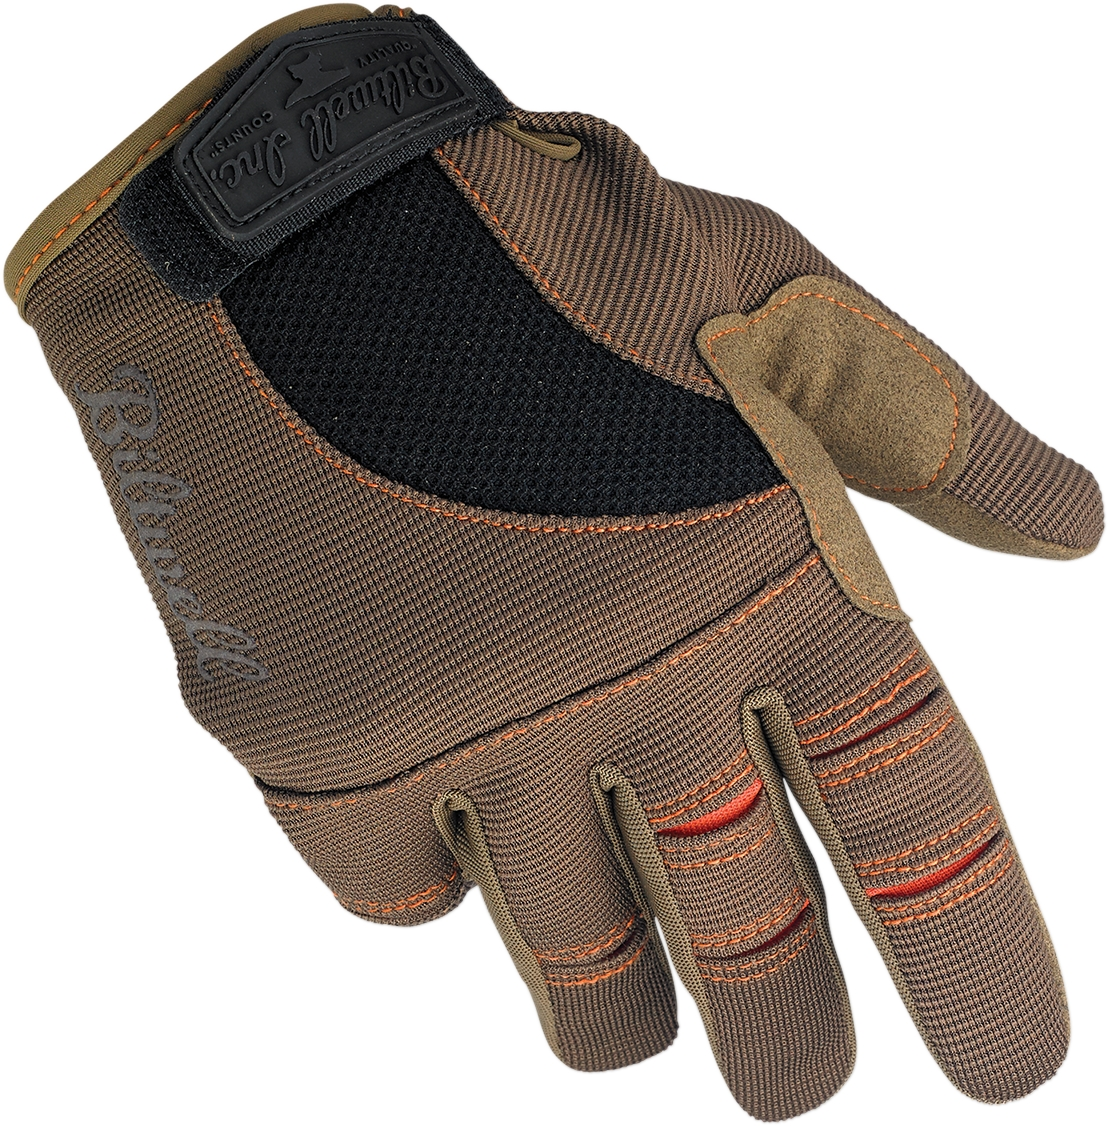 BILTWELL Moto Gloves Black/Red XL  GL-XLG-BK-RD